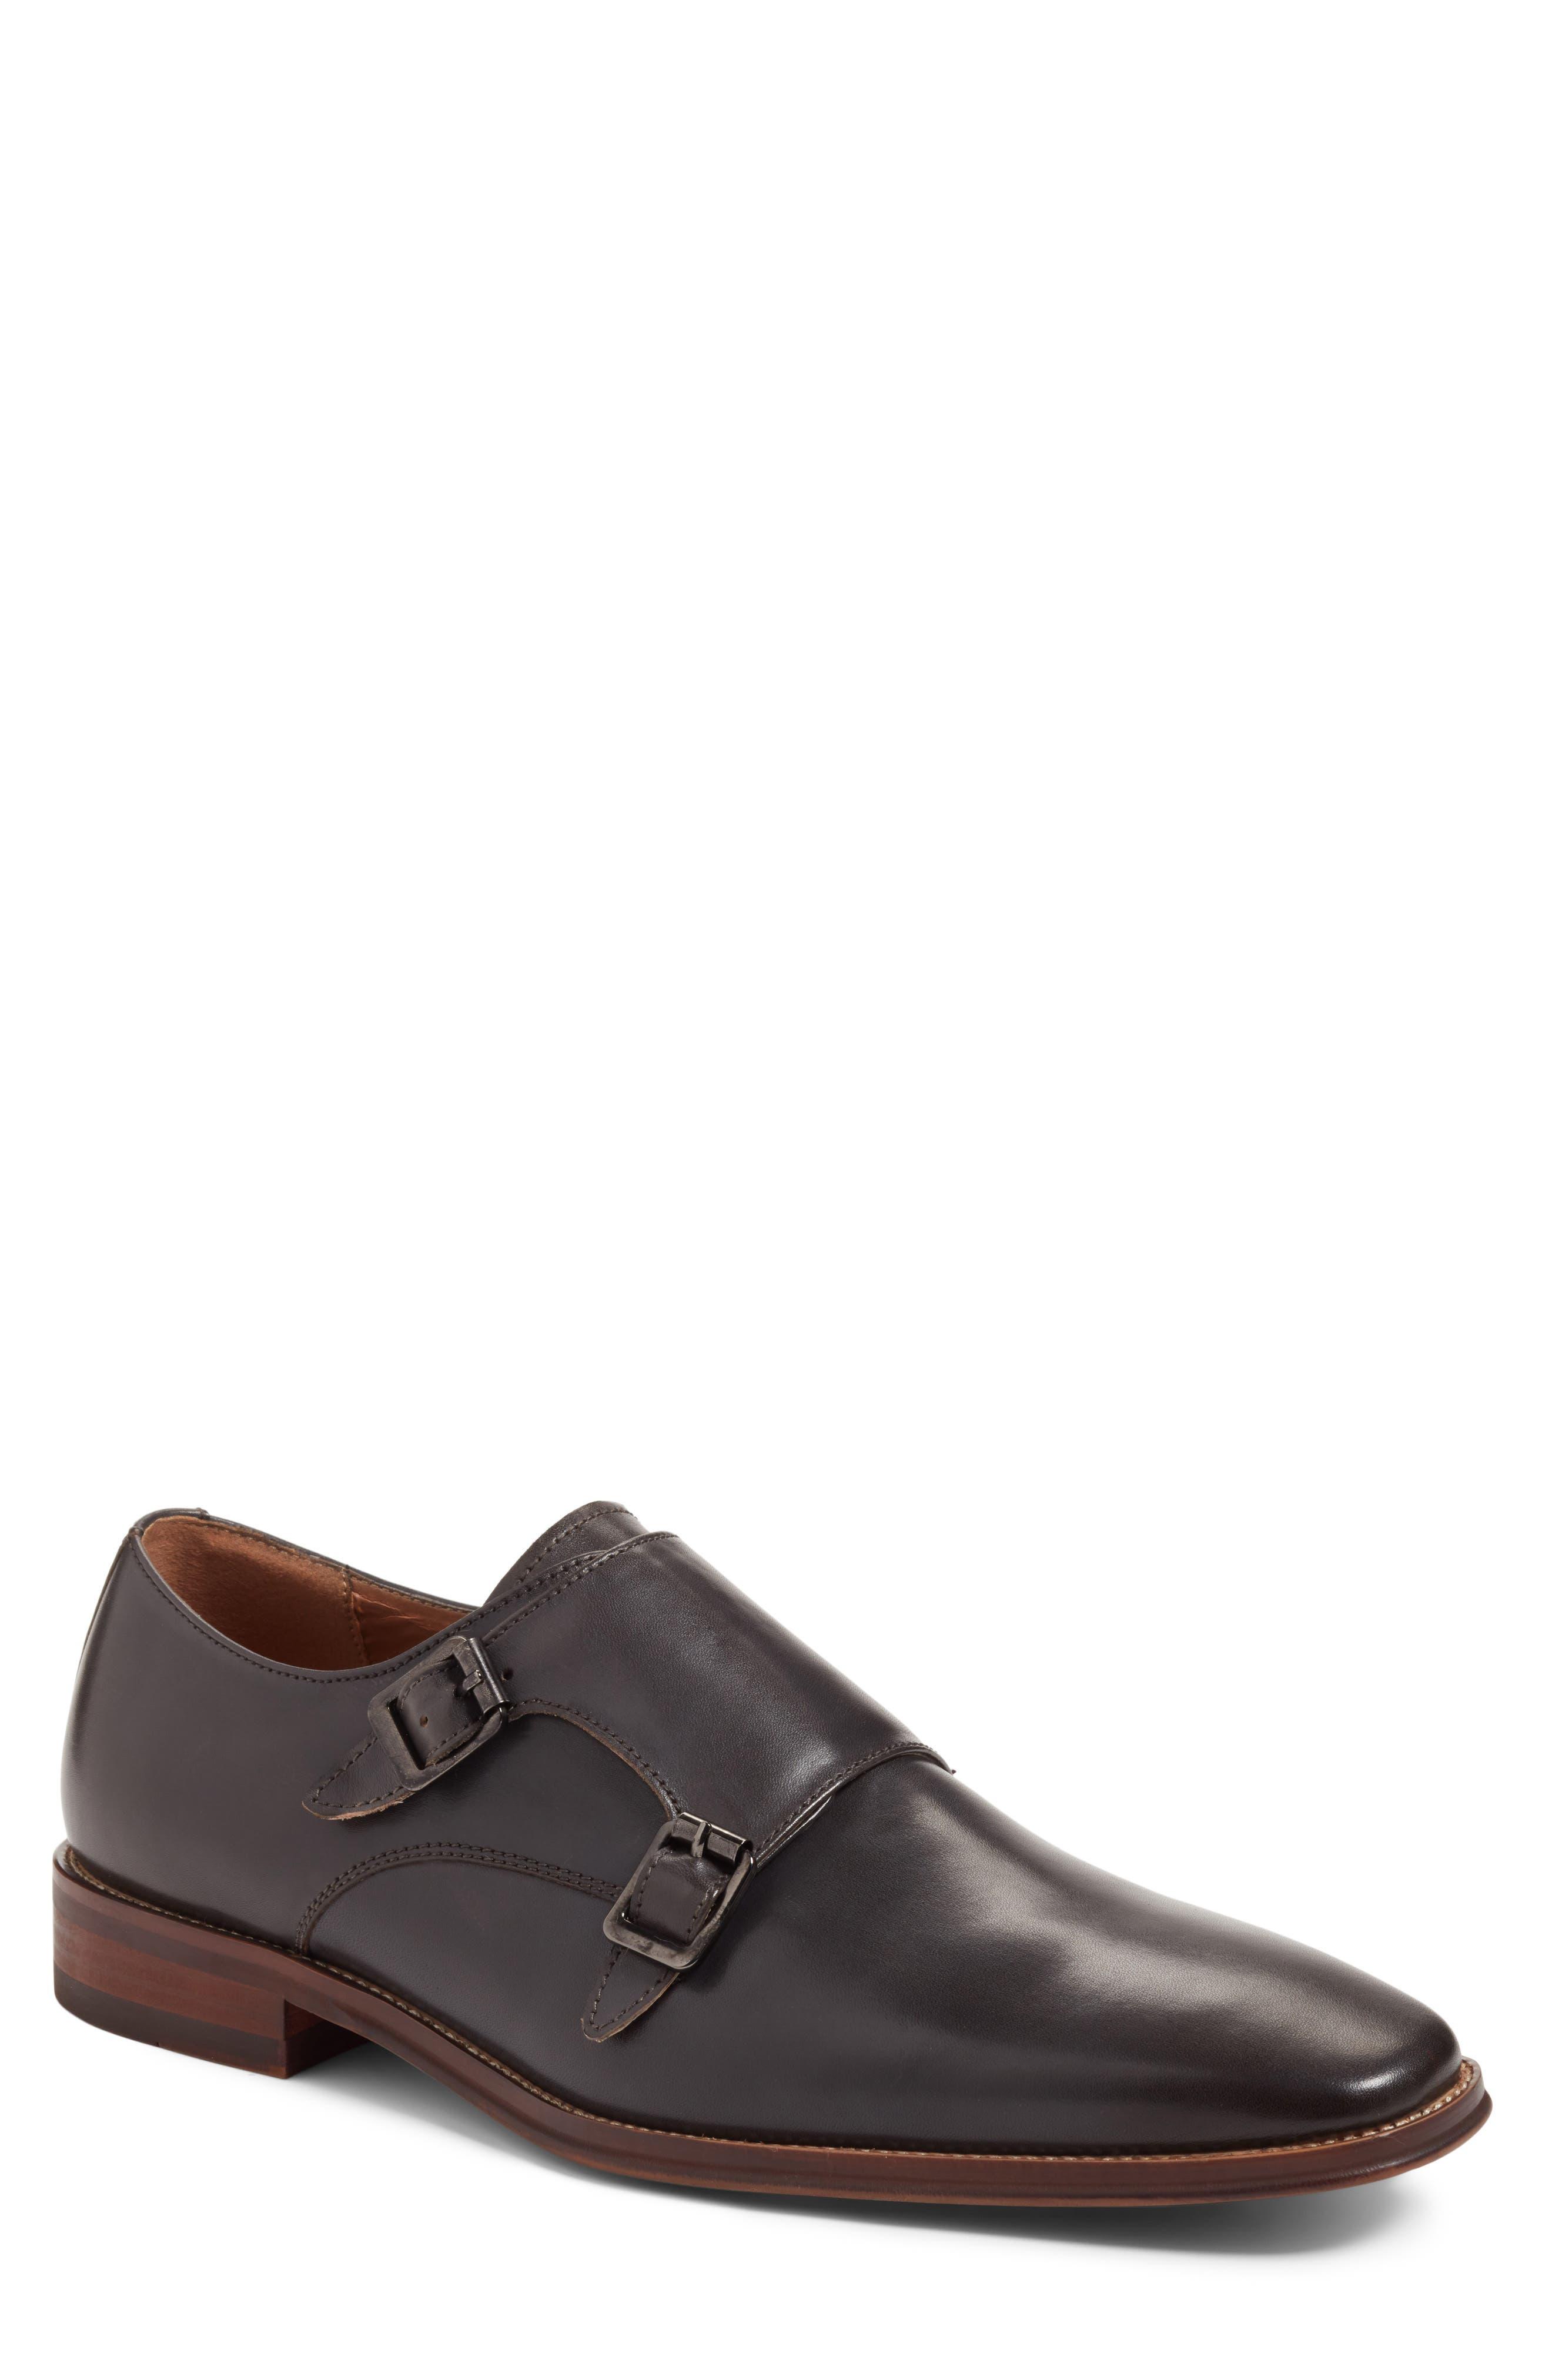 Sedona Double Strap Monk Shoe,                         Main,                         color, Grey Leather